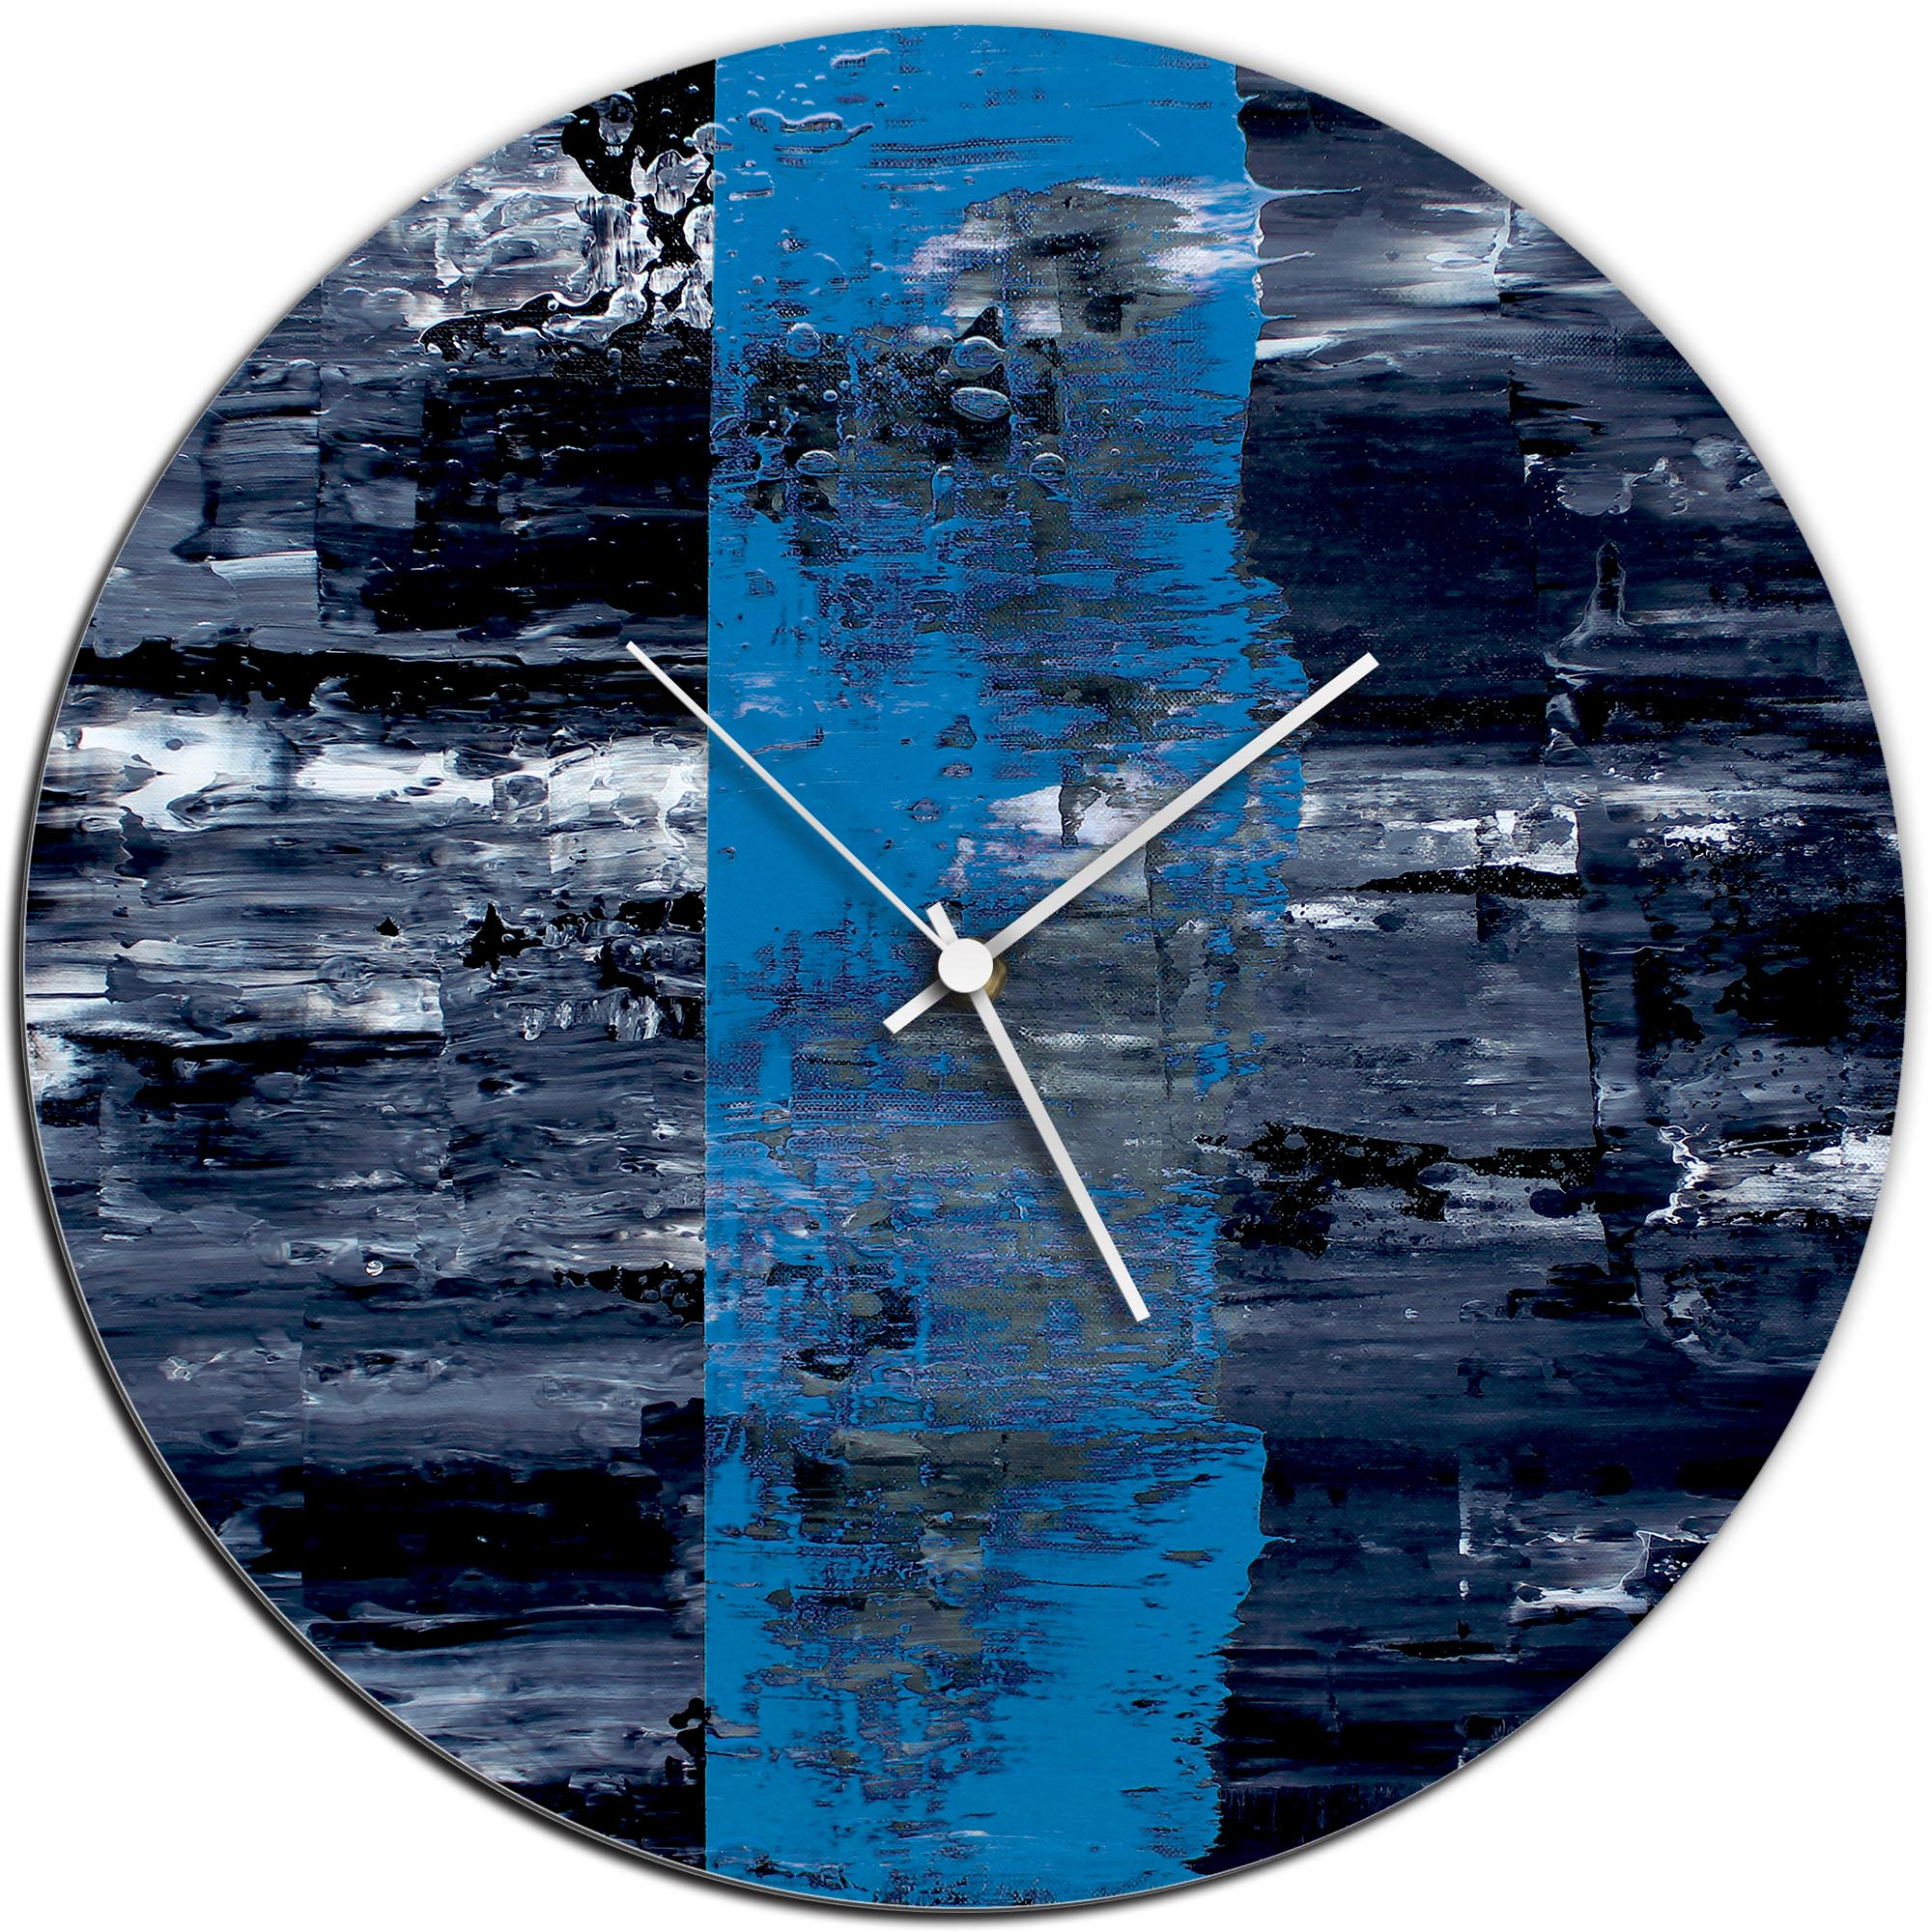 Mendo Vasilevski 'Blue Line Circle Clock Large' 22in x 22in Modern Wall Clock on Aluminum Composite